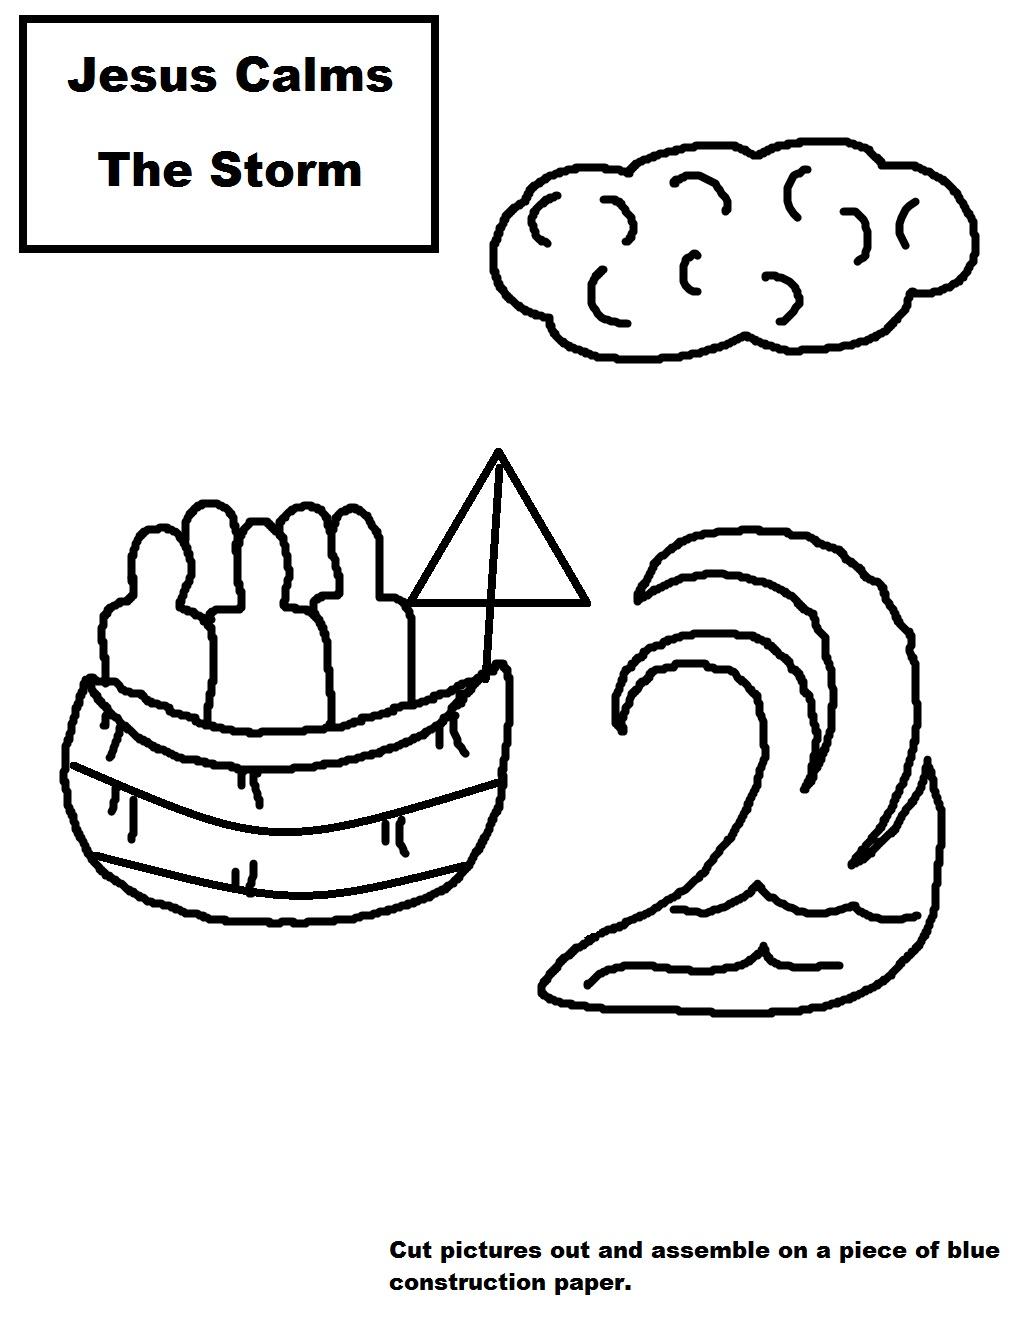 Jesus Calms The Storm Sunday School Lesson